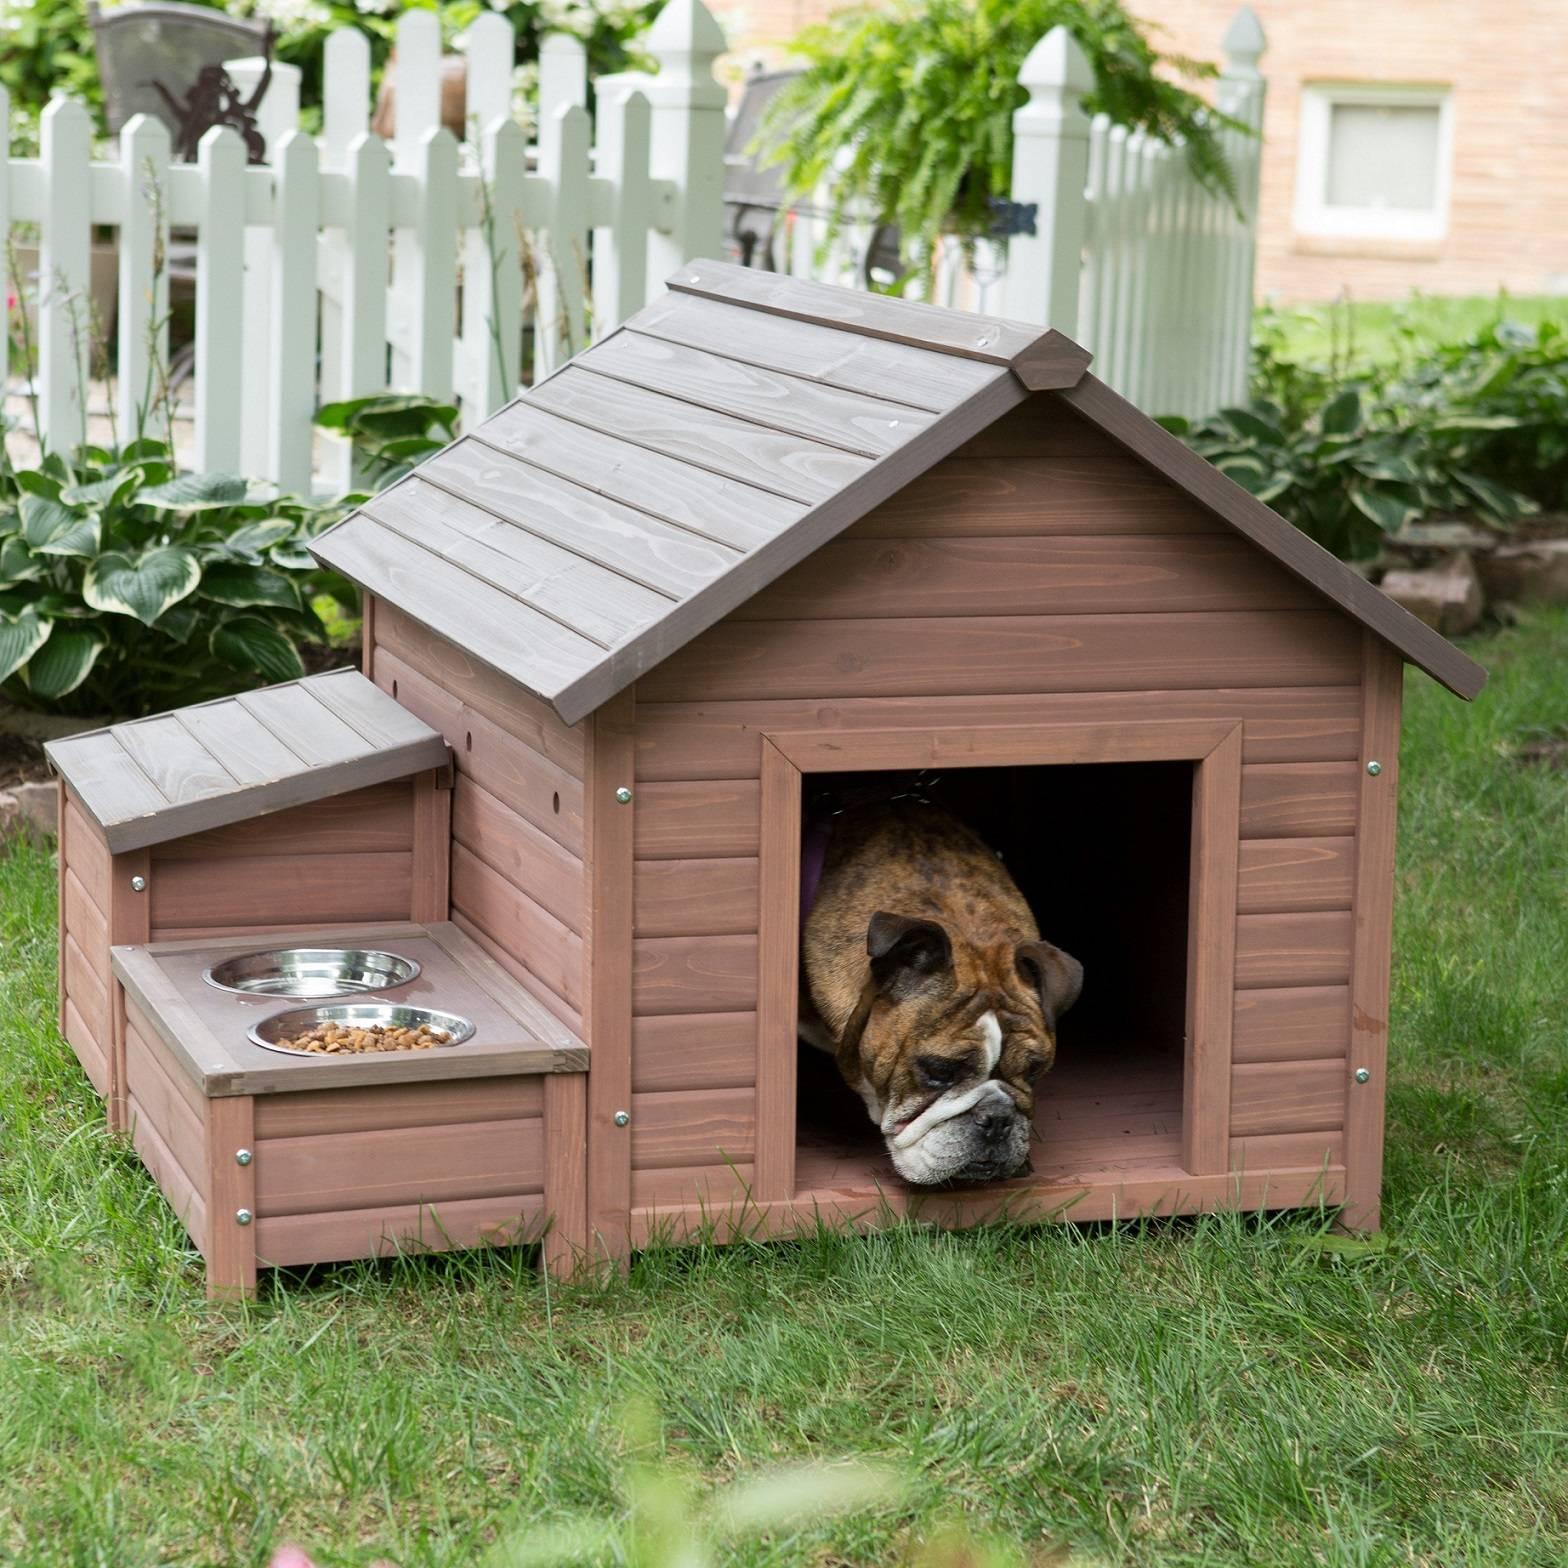 Home Design Ideas For Dogs: Diy Dog House Beginner Ideas - House Plans